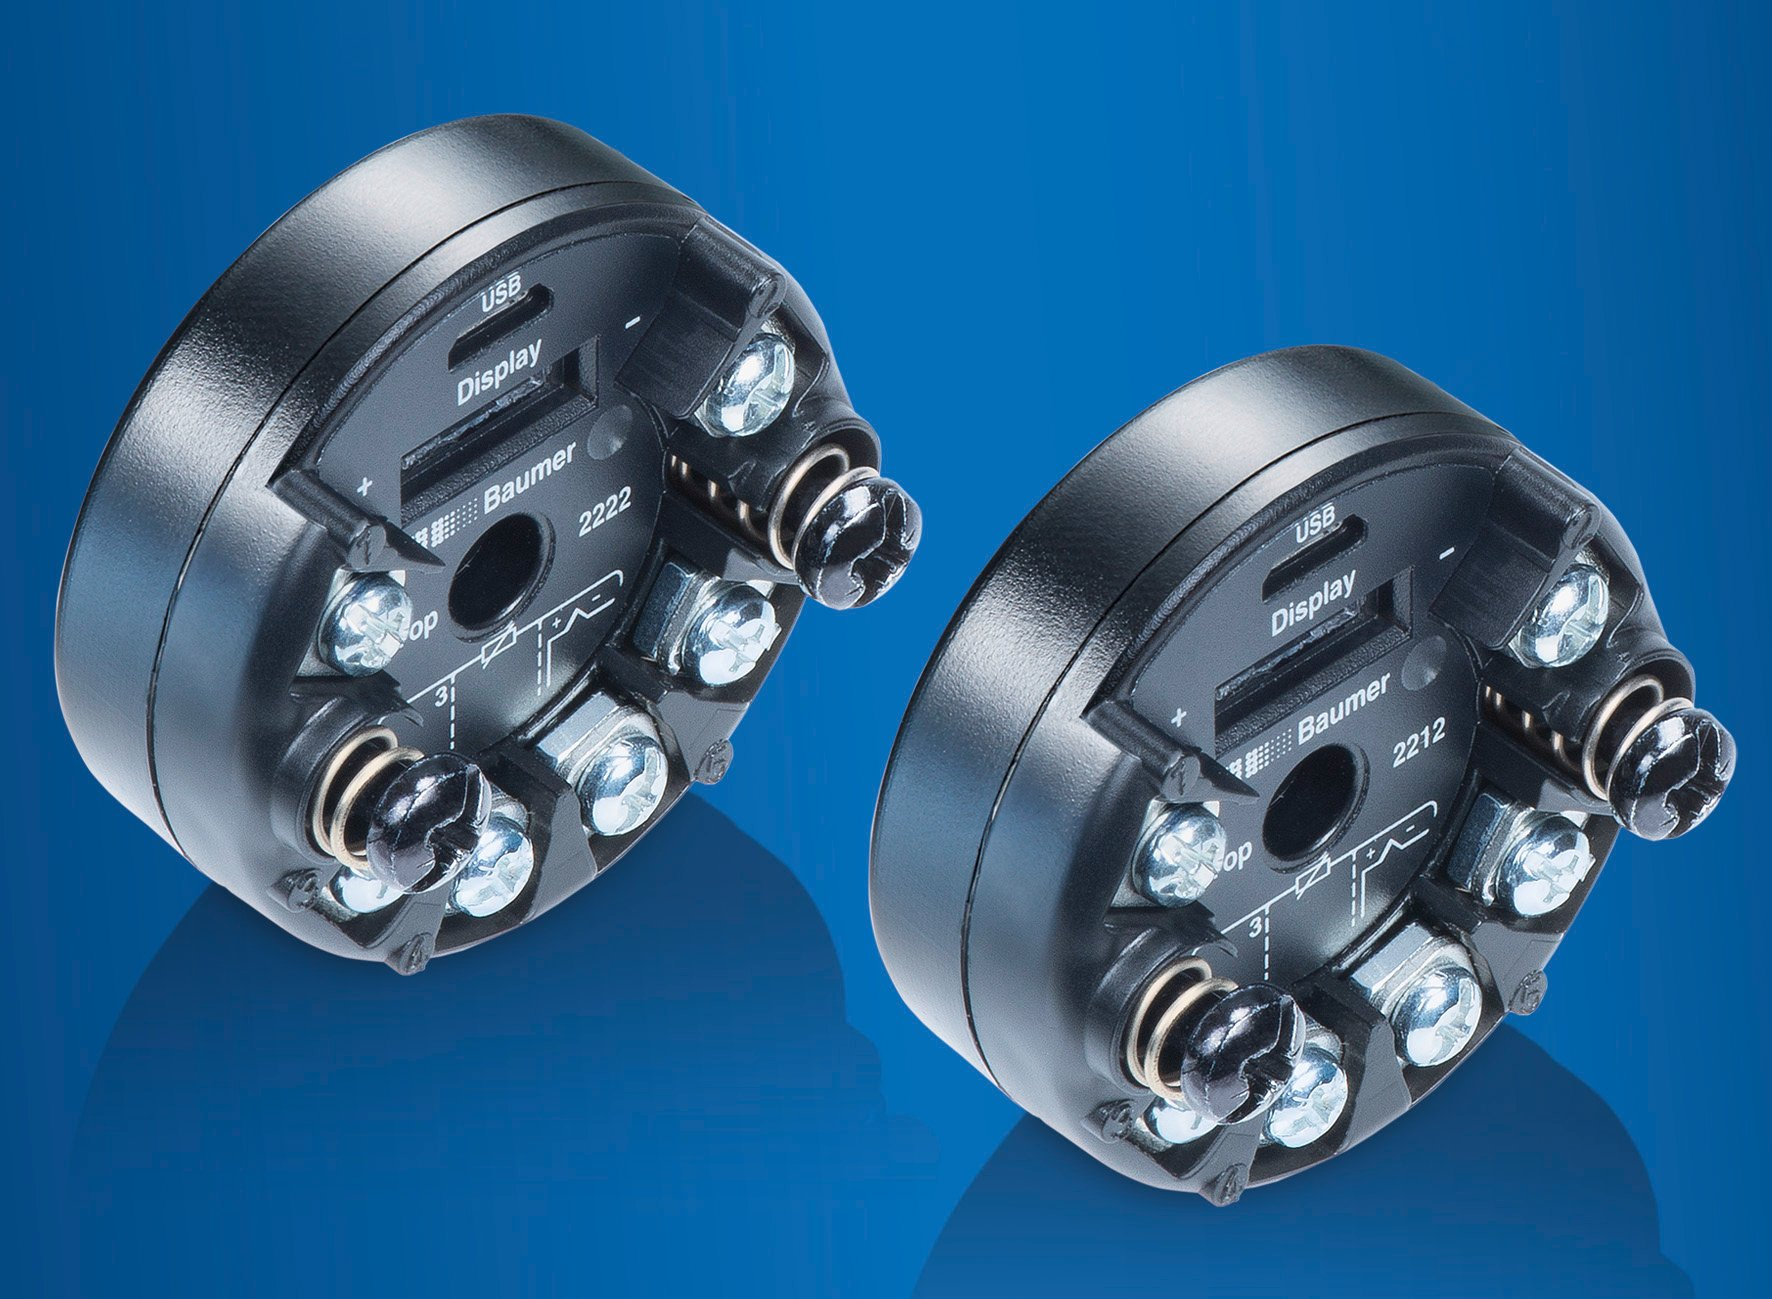 Flextop 2212 And 2222 Flexible Universal Temperature Transmitters Sensor Current Loop Transmitter For Improved User Friendliness